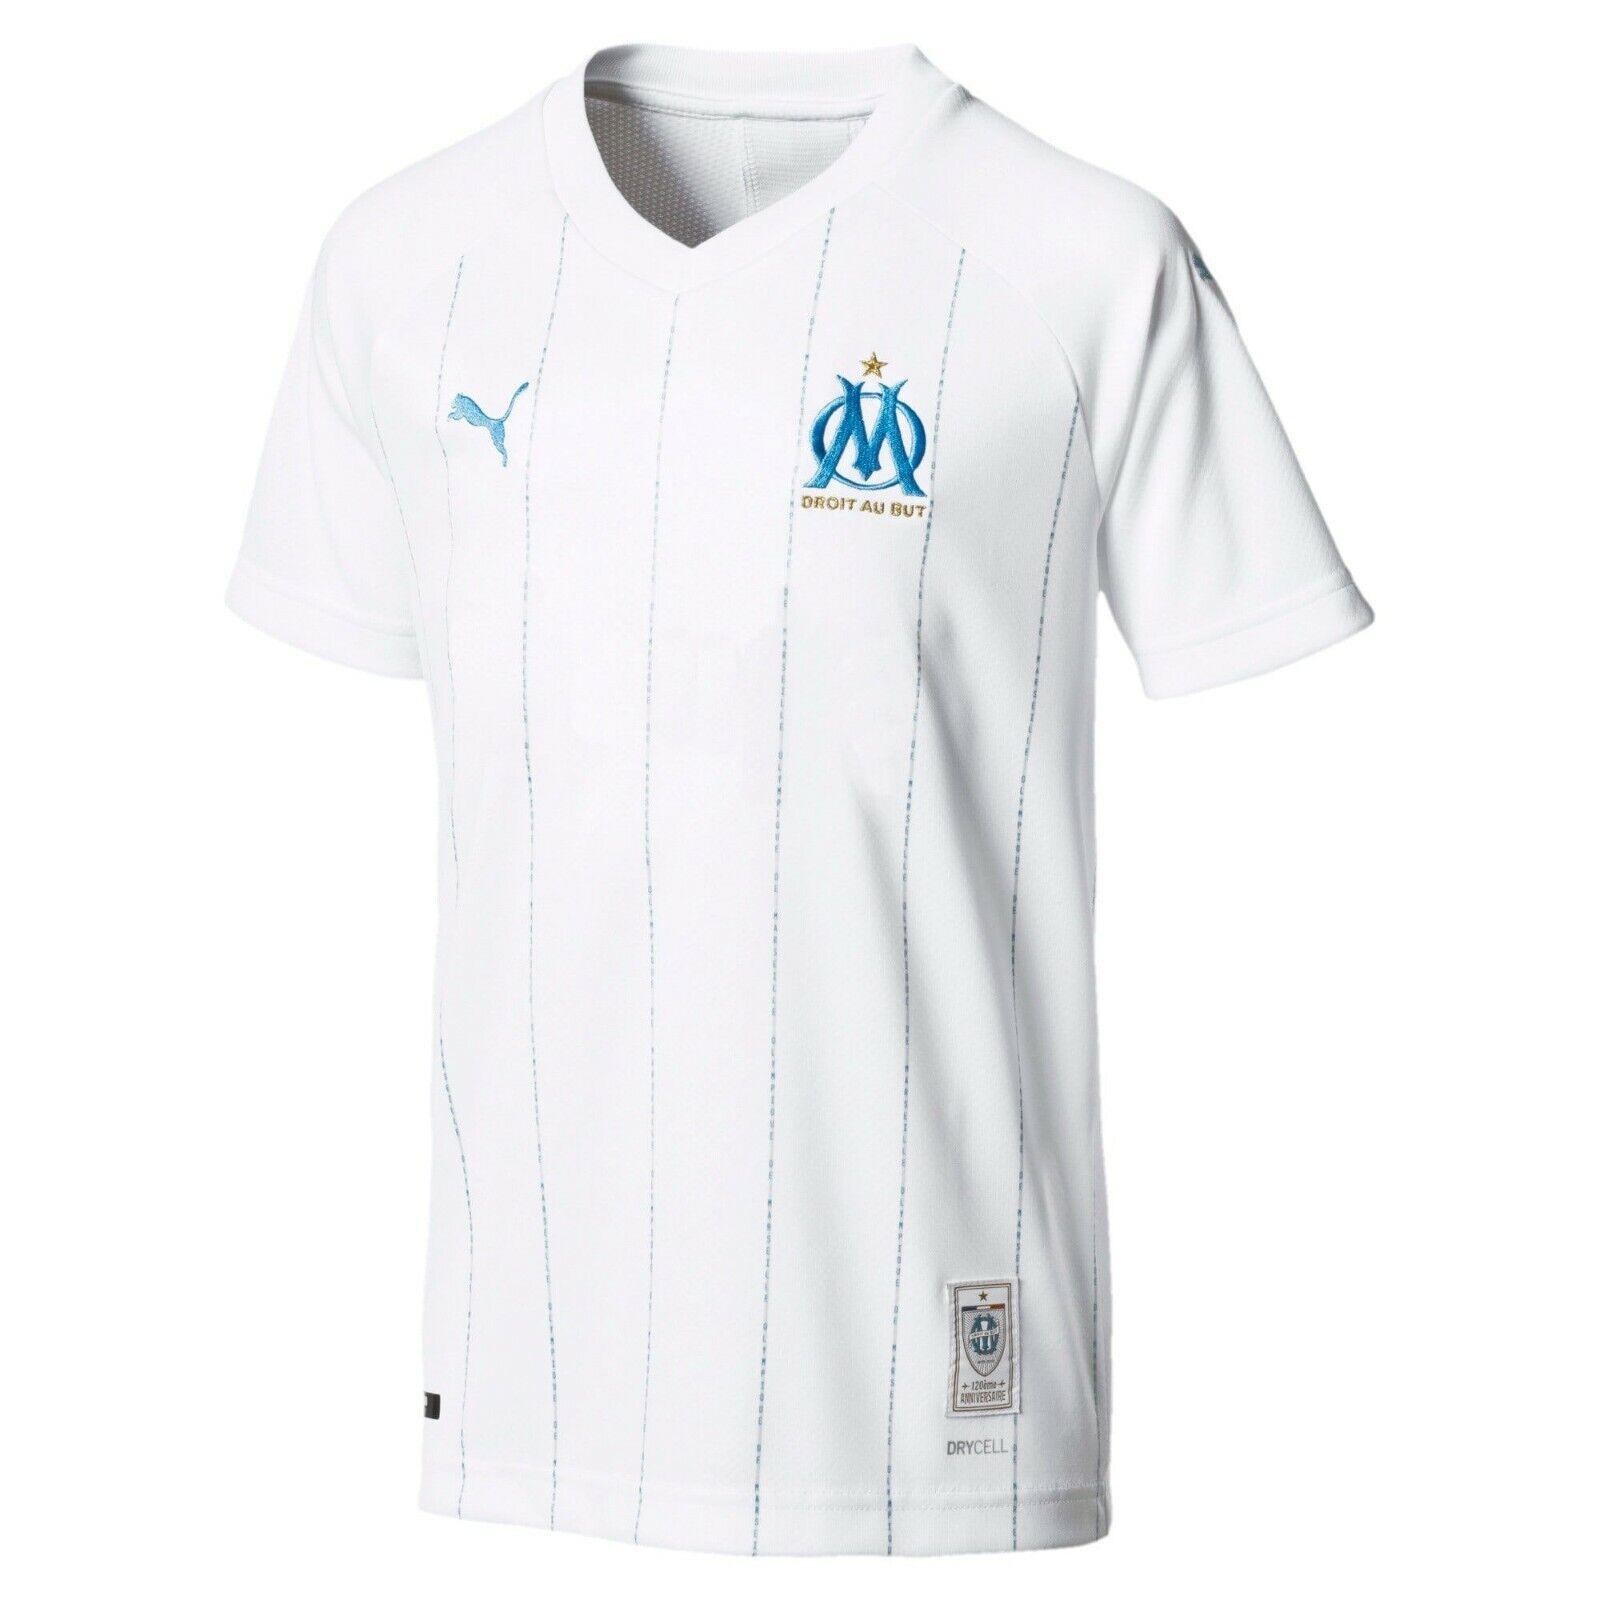 PUMA Olympique de Marseille Home Kit Jersey 2019/2020 Men's